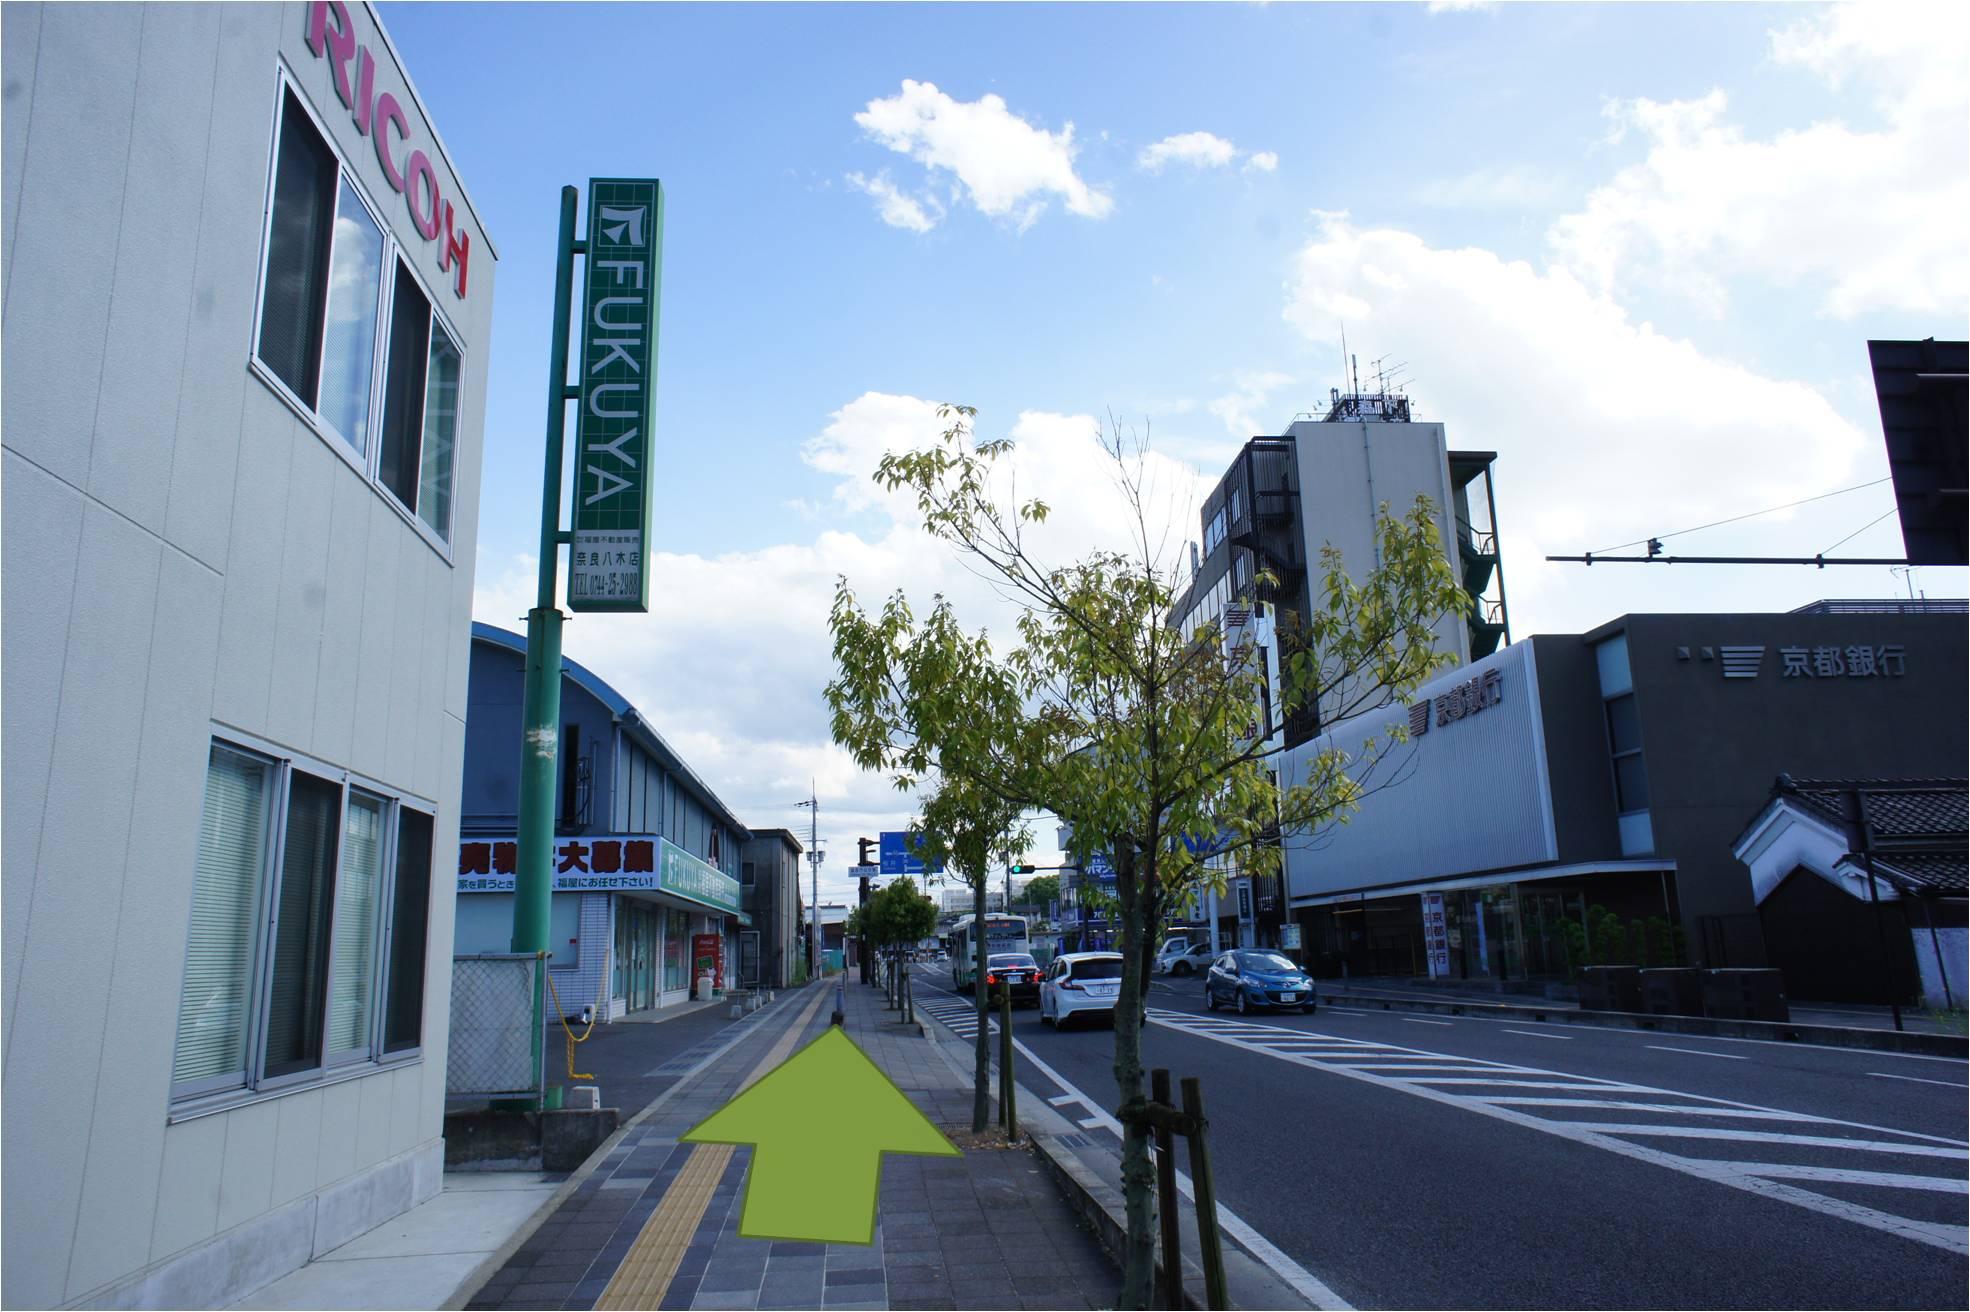 RICOH、福屋工務店を左に見ながら直進